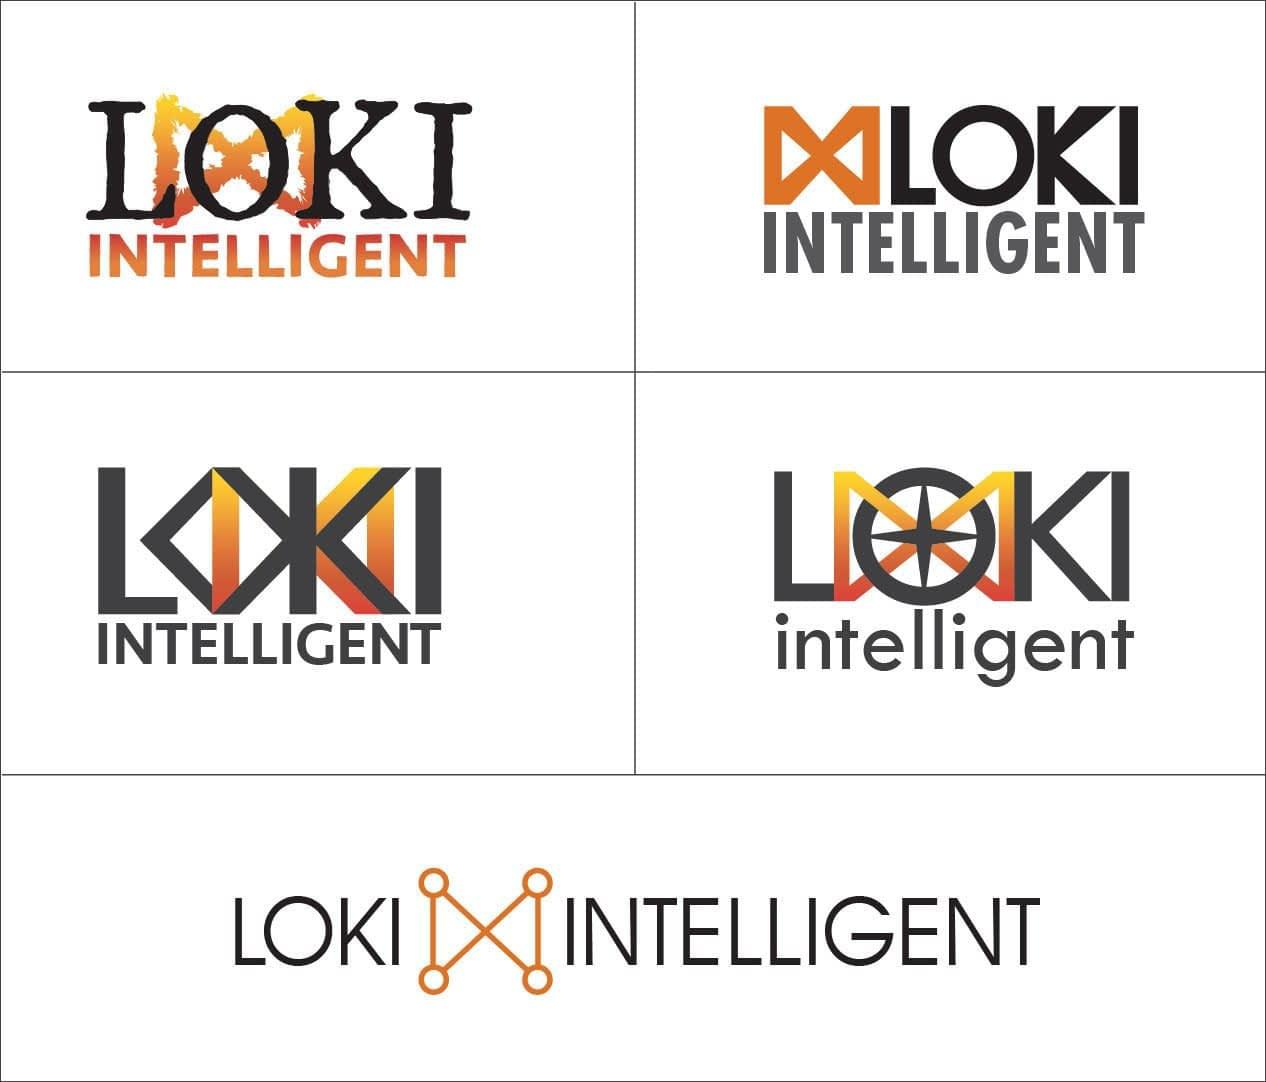 Loki Intelligent logo design concepts